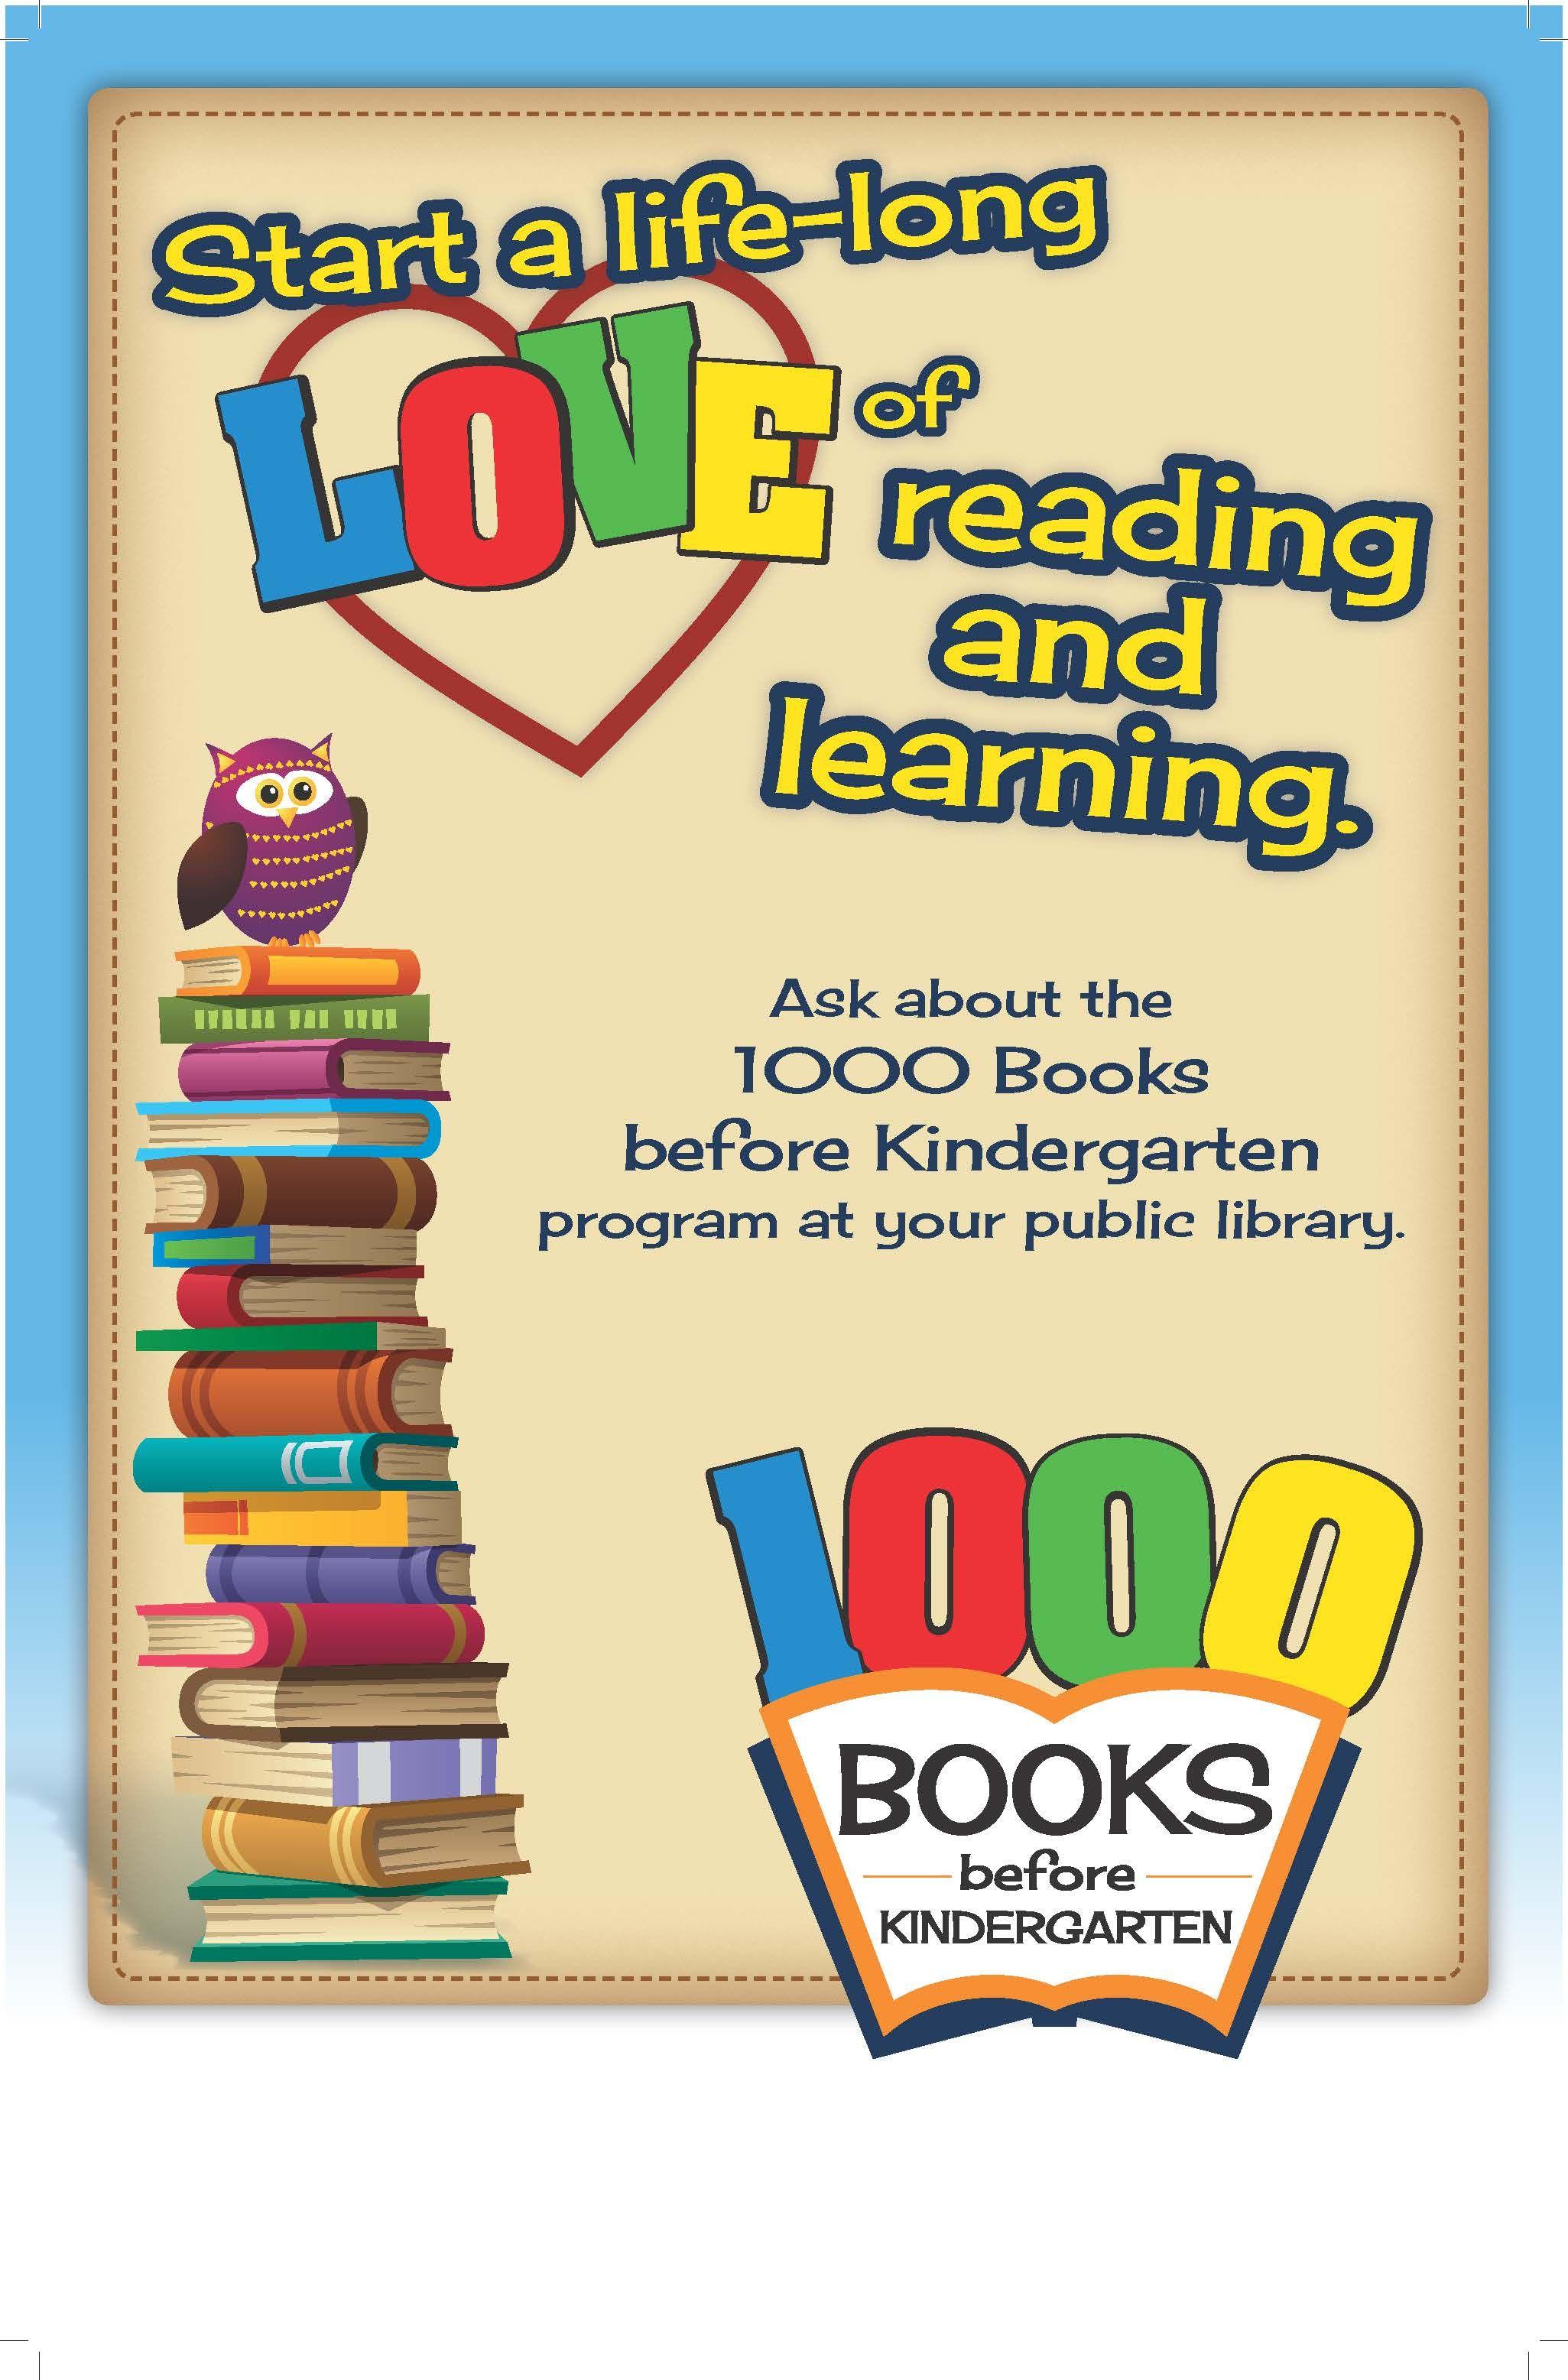 1000 books before kindergarten initiative poster developed